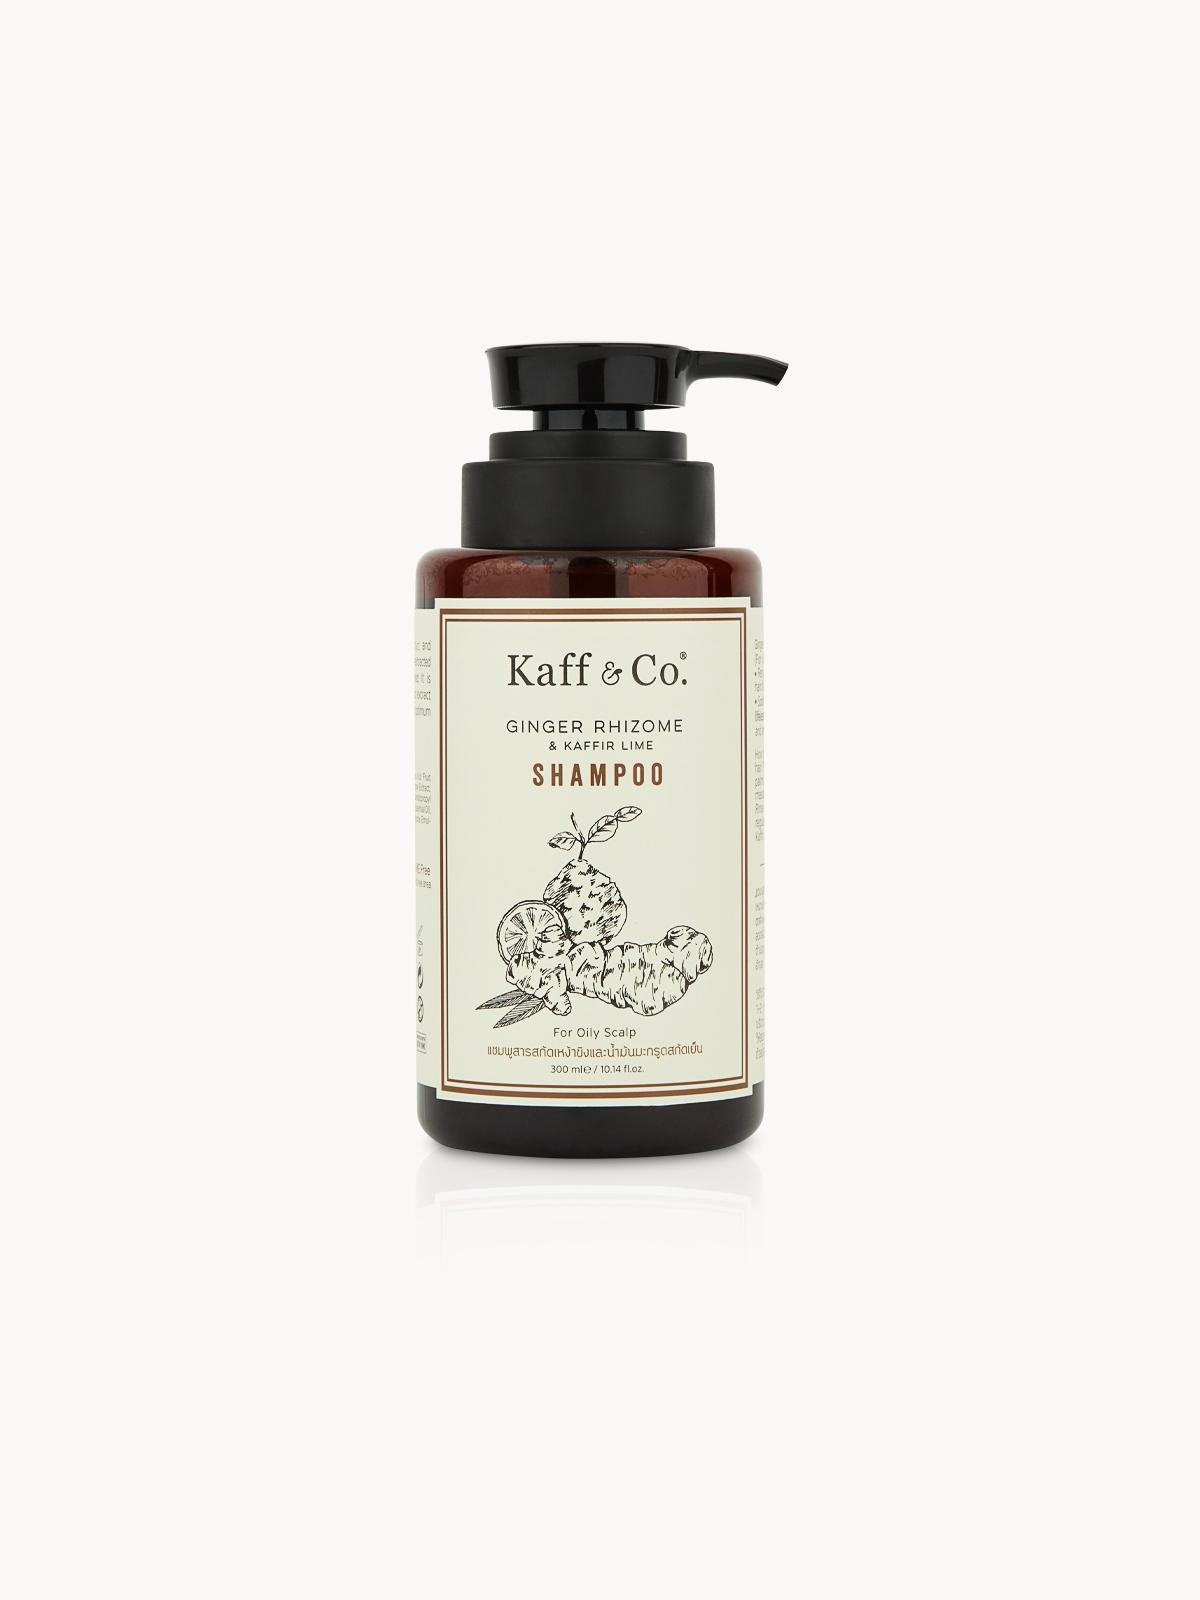 Kaff Co Ginger Rhizome Kaffir Lime Shampoo 300 ml